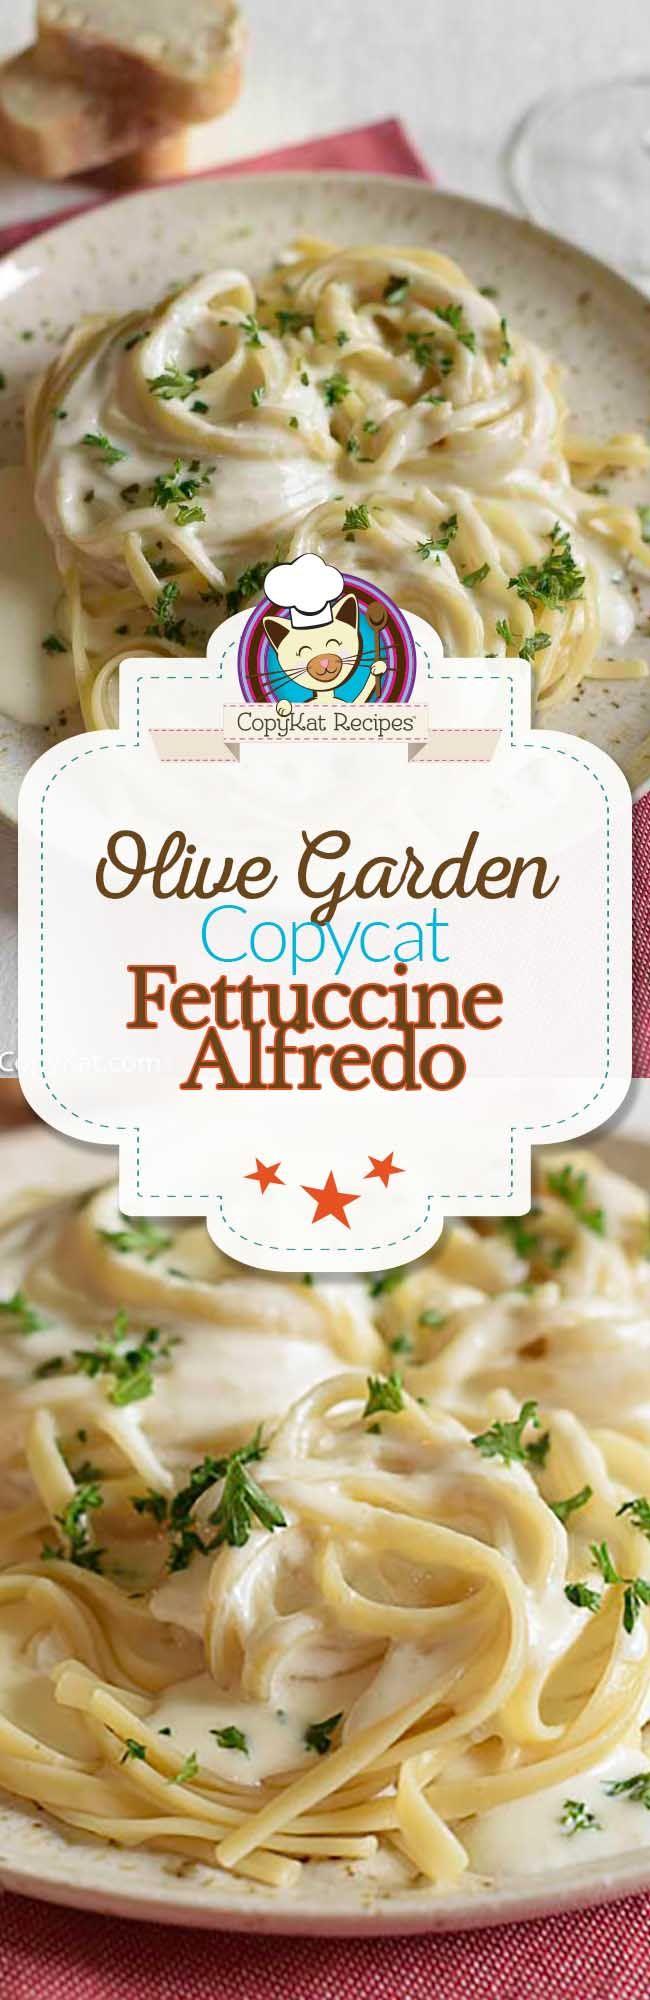 Olive garden alfredo sauce recipe recipes to cook - Olive garden alfredo sauce recipe copycat ...